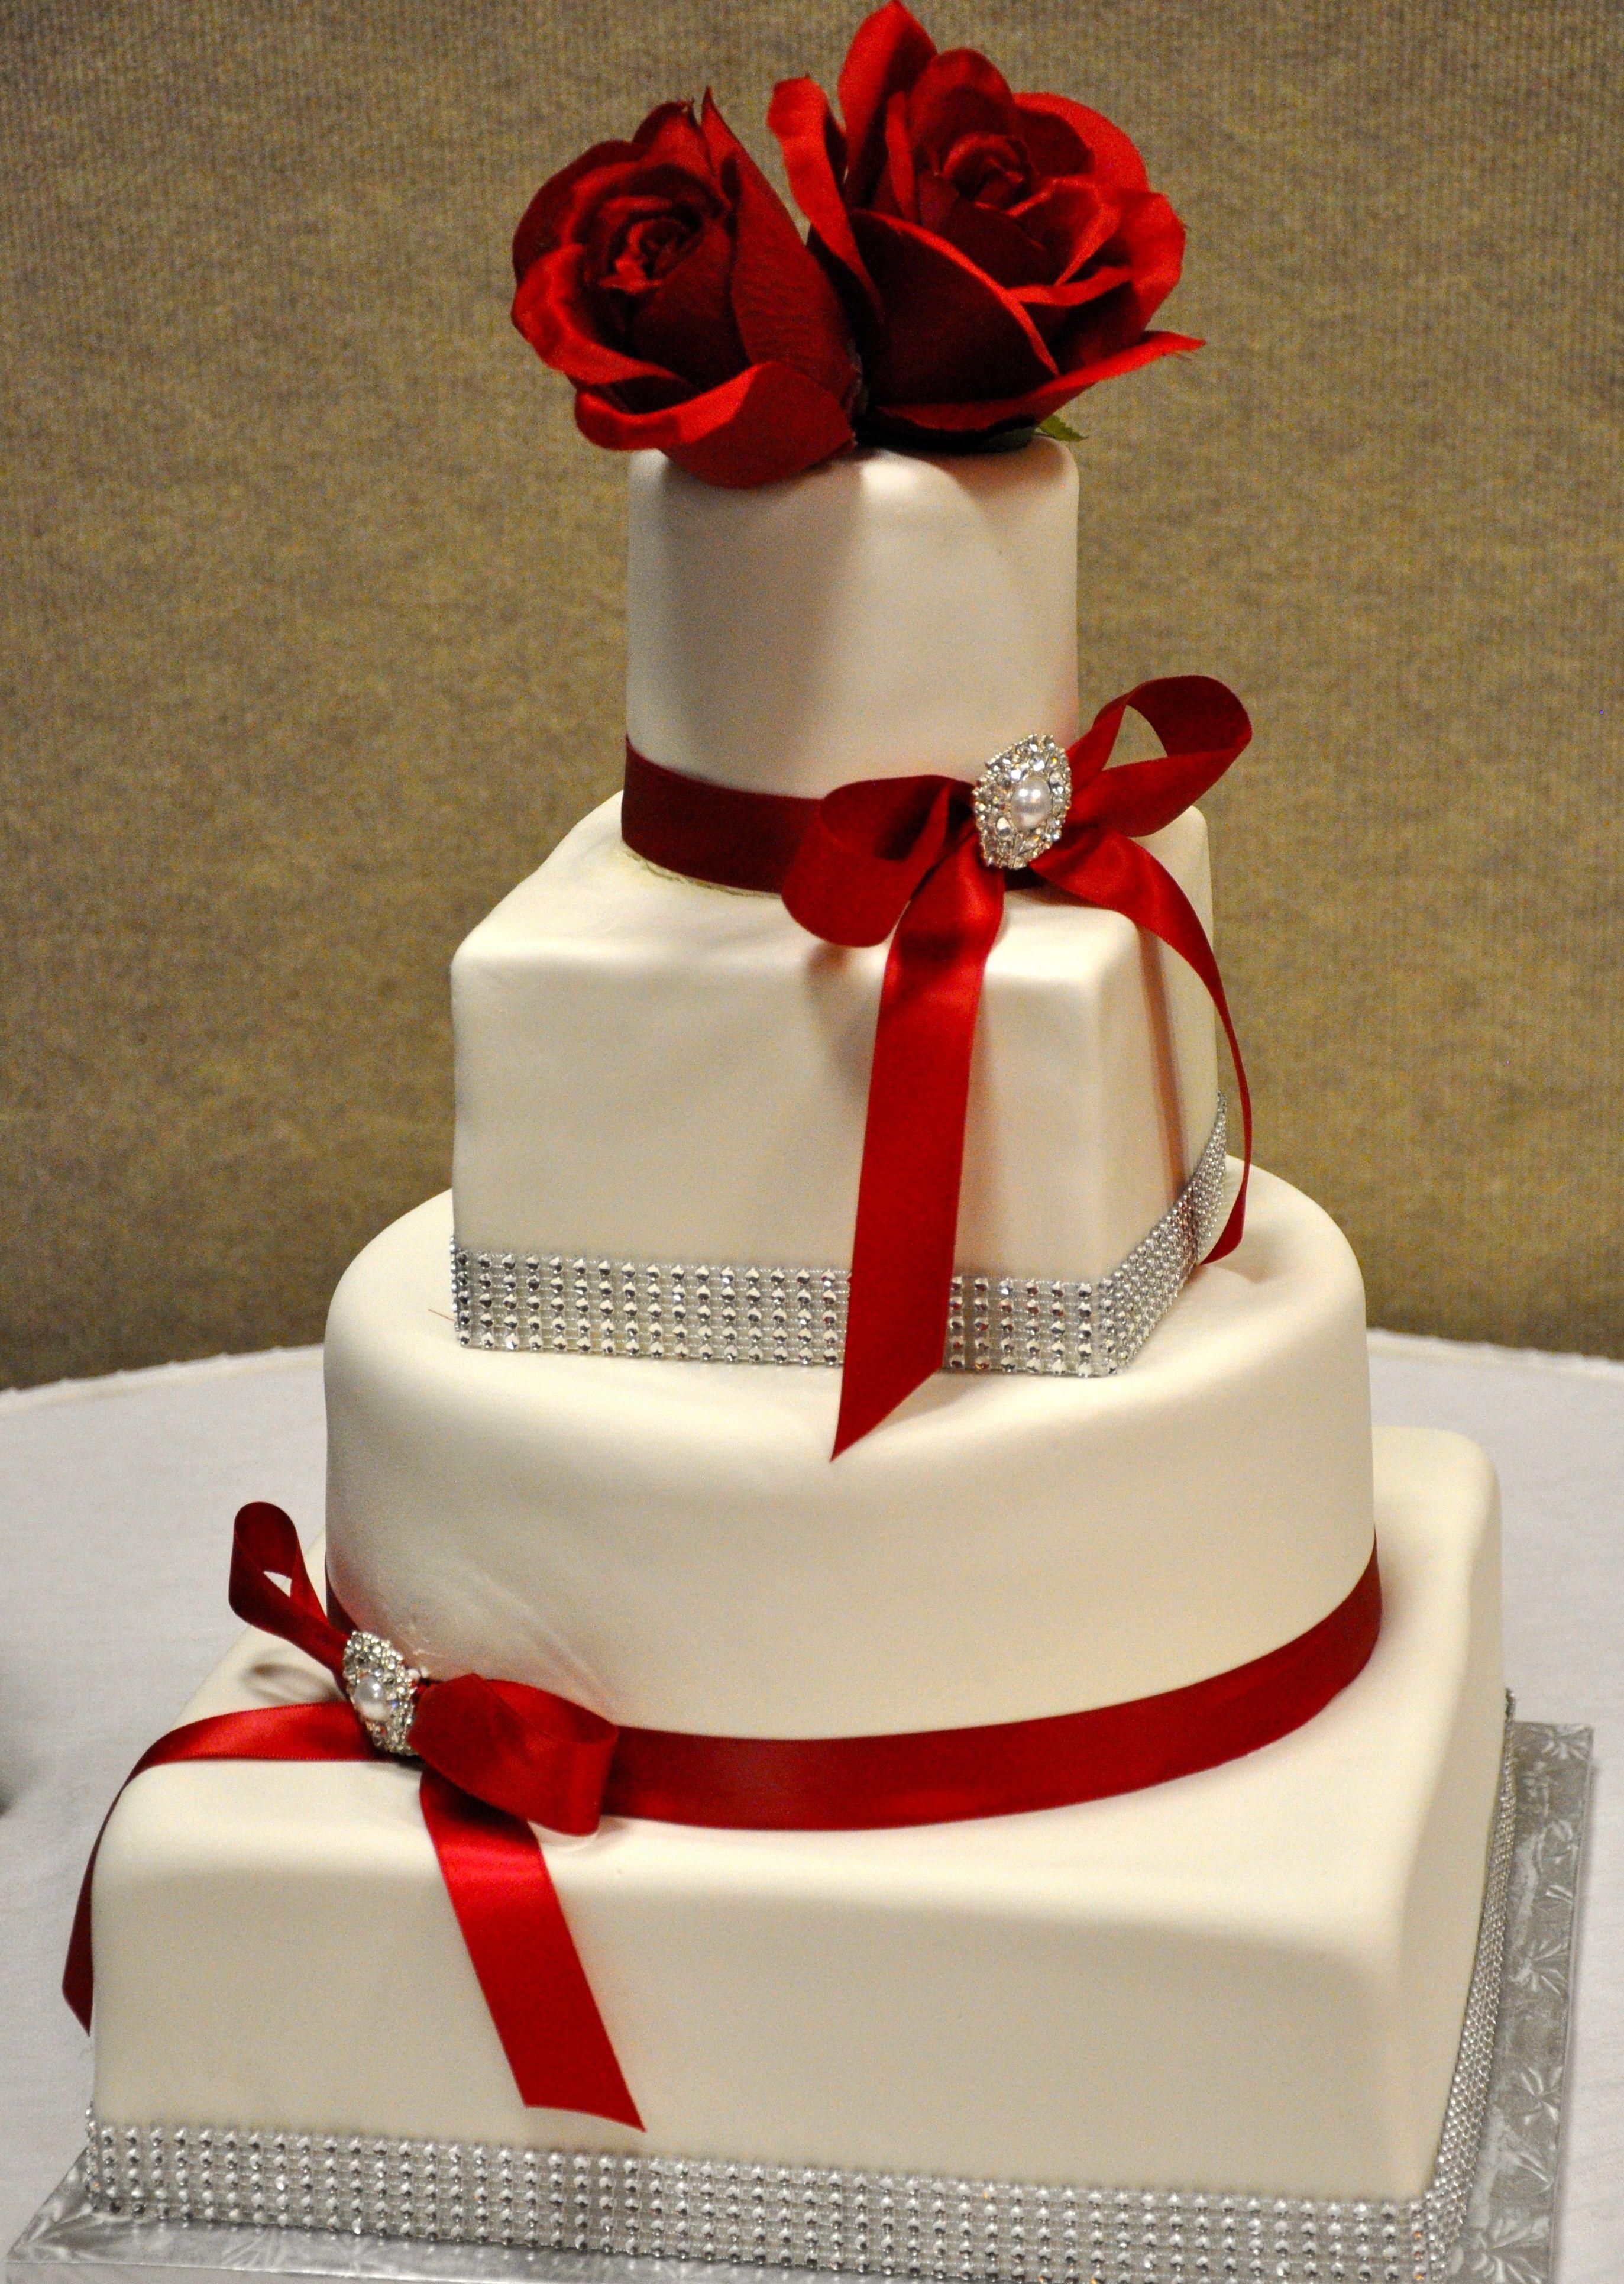 Three Tier Wedding Cake With Red Flowers And Ribbon Weddingcake